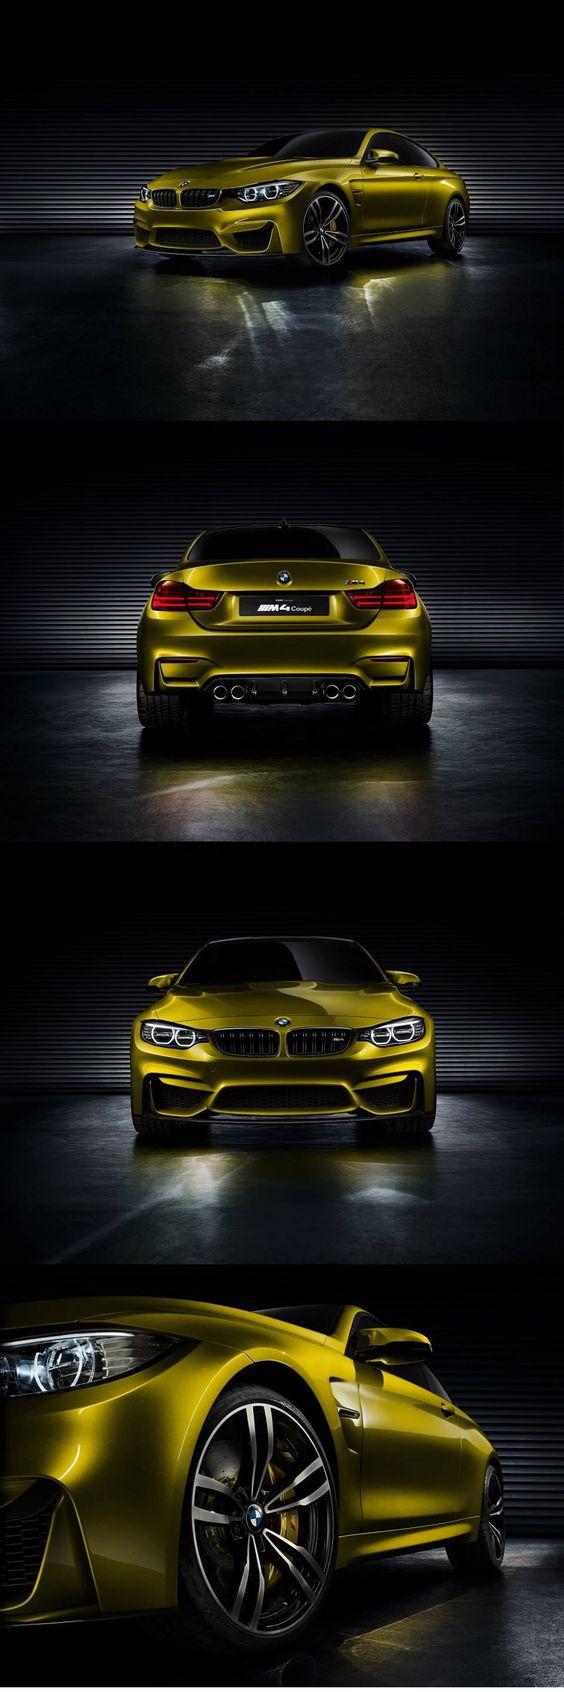 BMW ///M4 - good bye  ///M3 hello ///M4